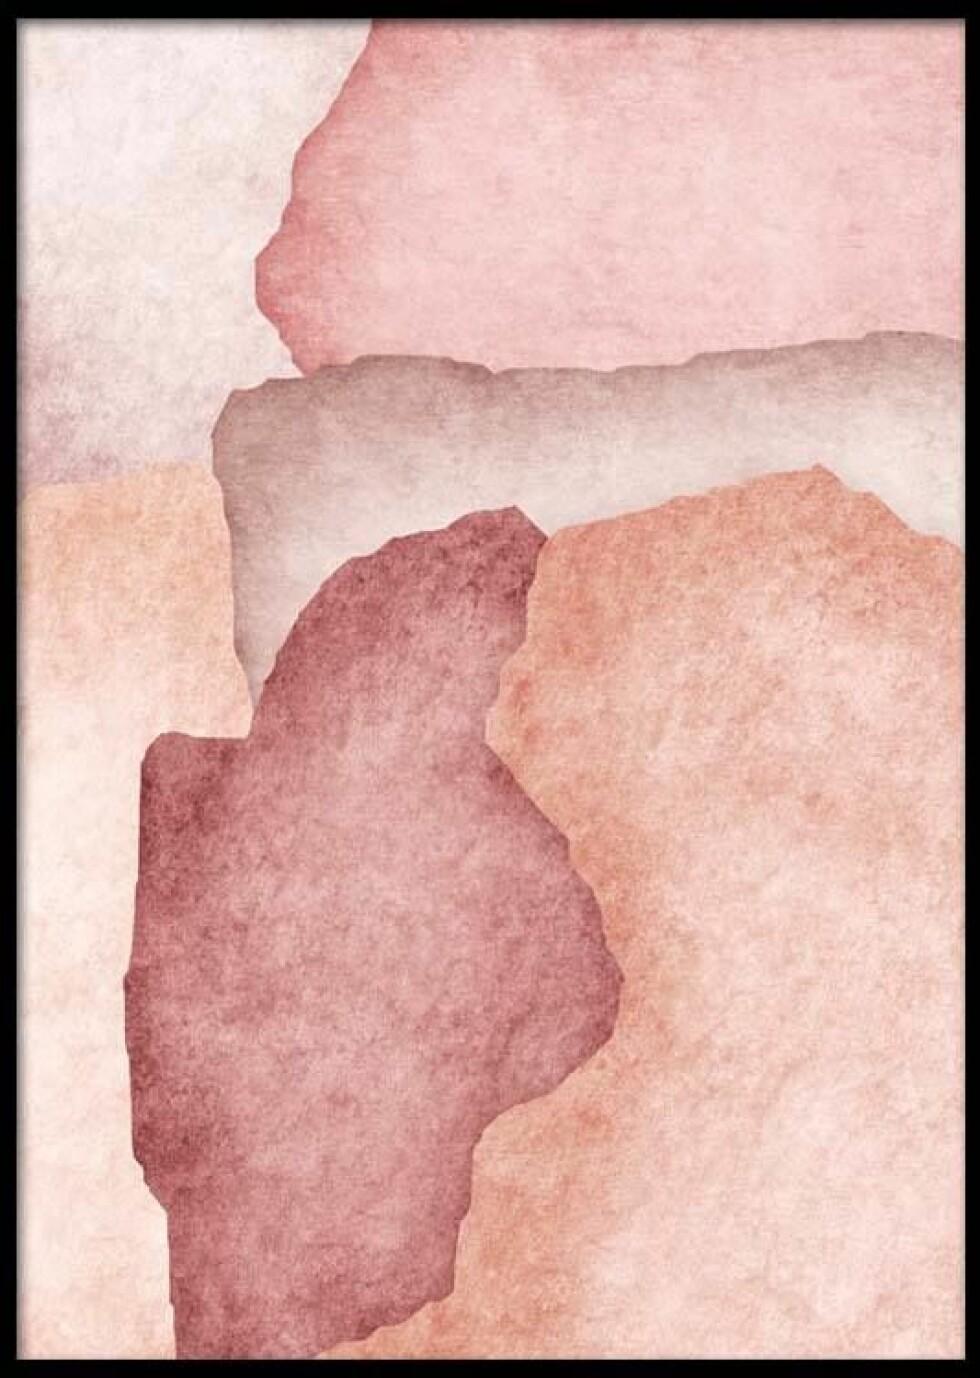 Plakat fra Desenio  69,-  https://desenio.no/no/artiklar/pink-watercolor-plakat.html